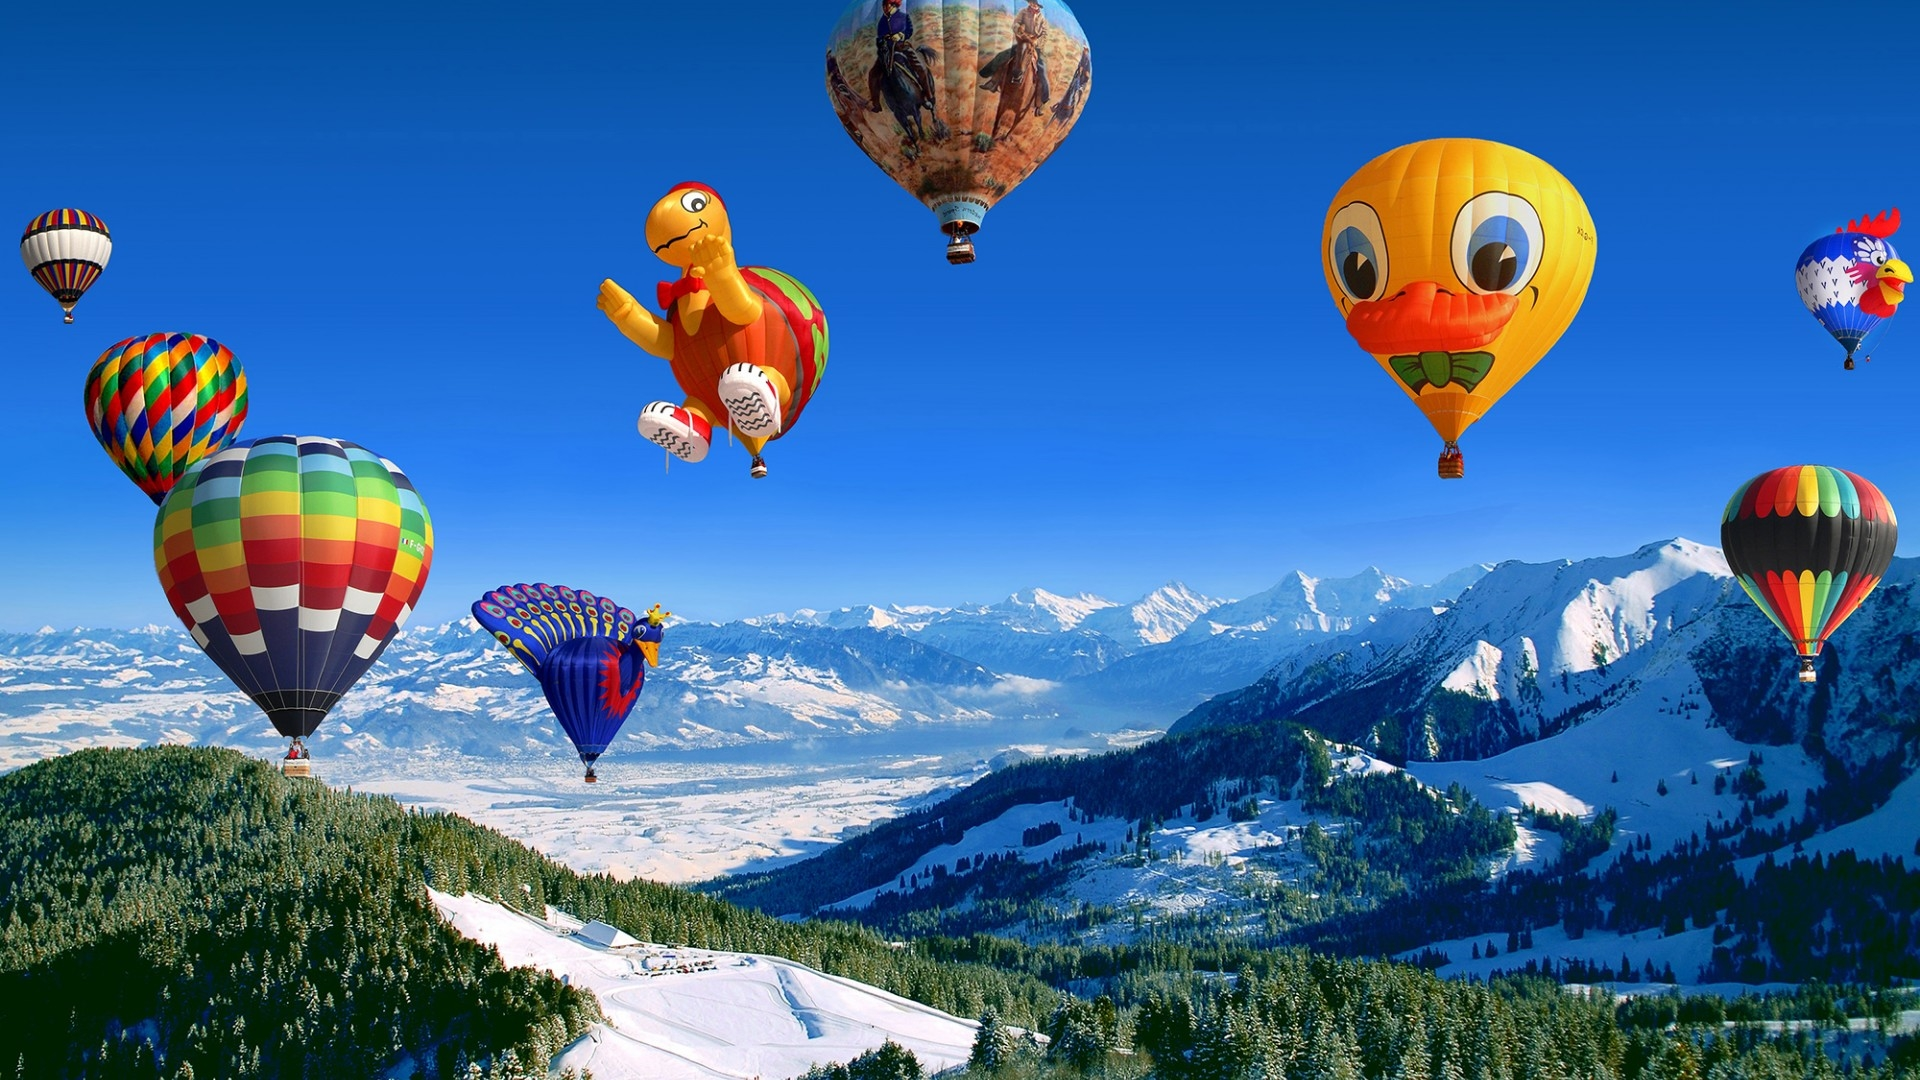 http://i6.imageban.ru/out/2014/11/16/0a7552a0f6f53dacf60dd85919084151.jpg